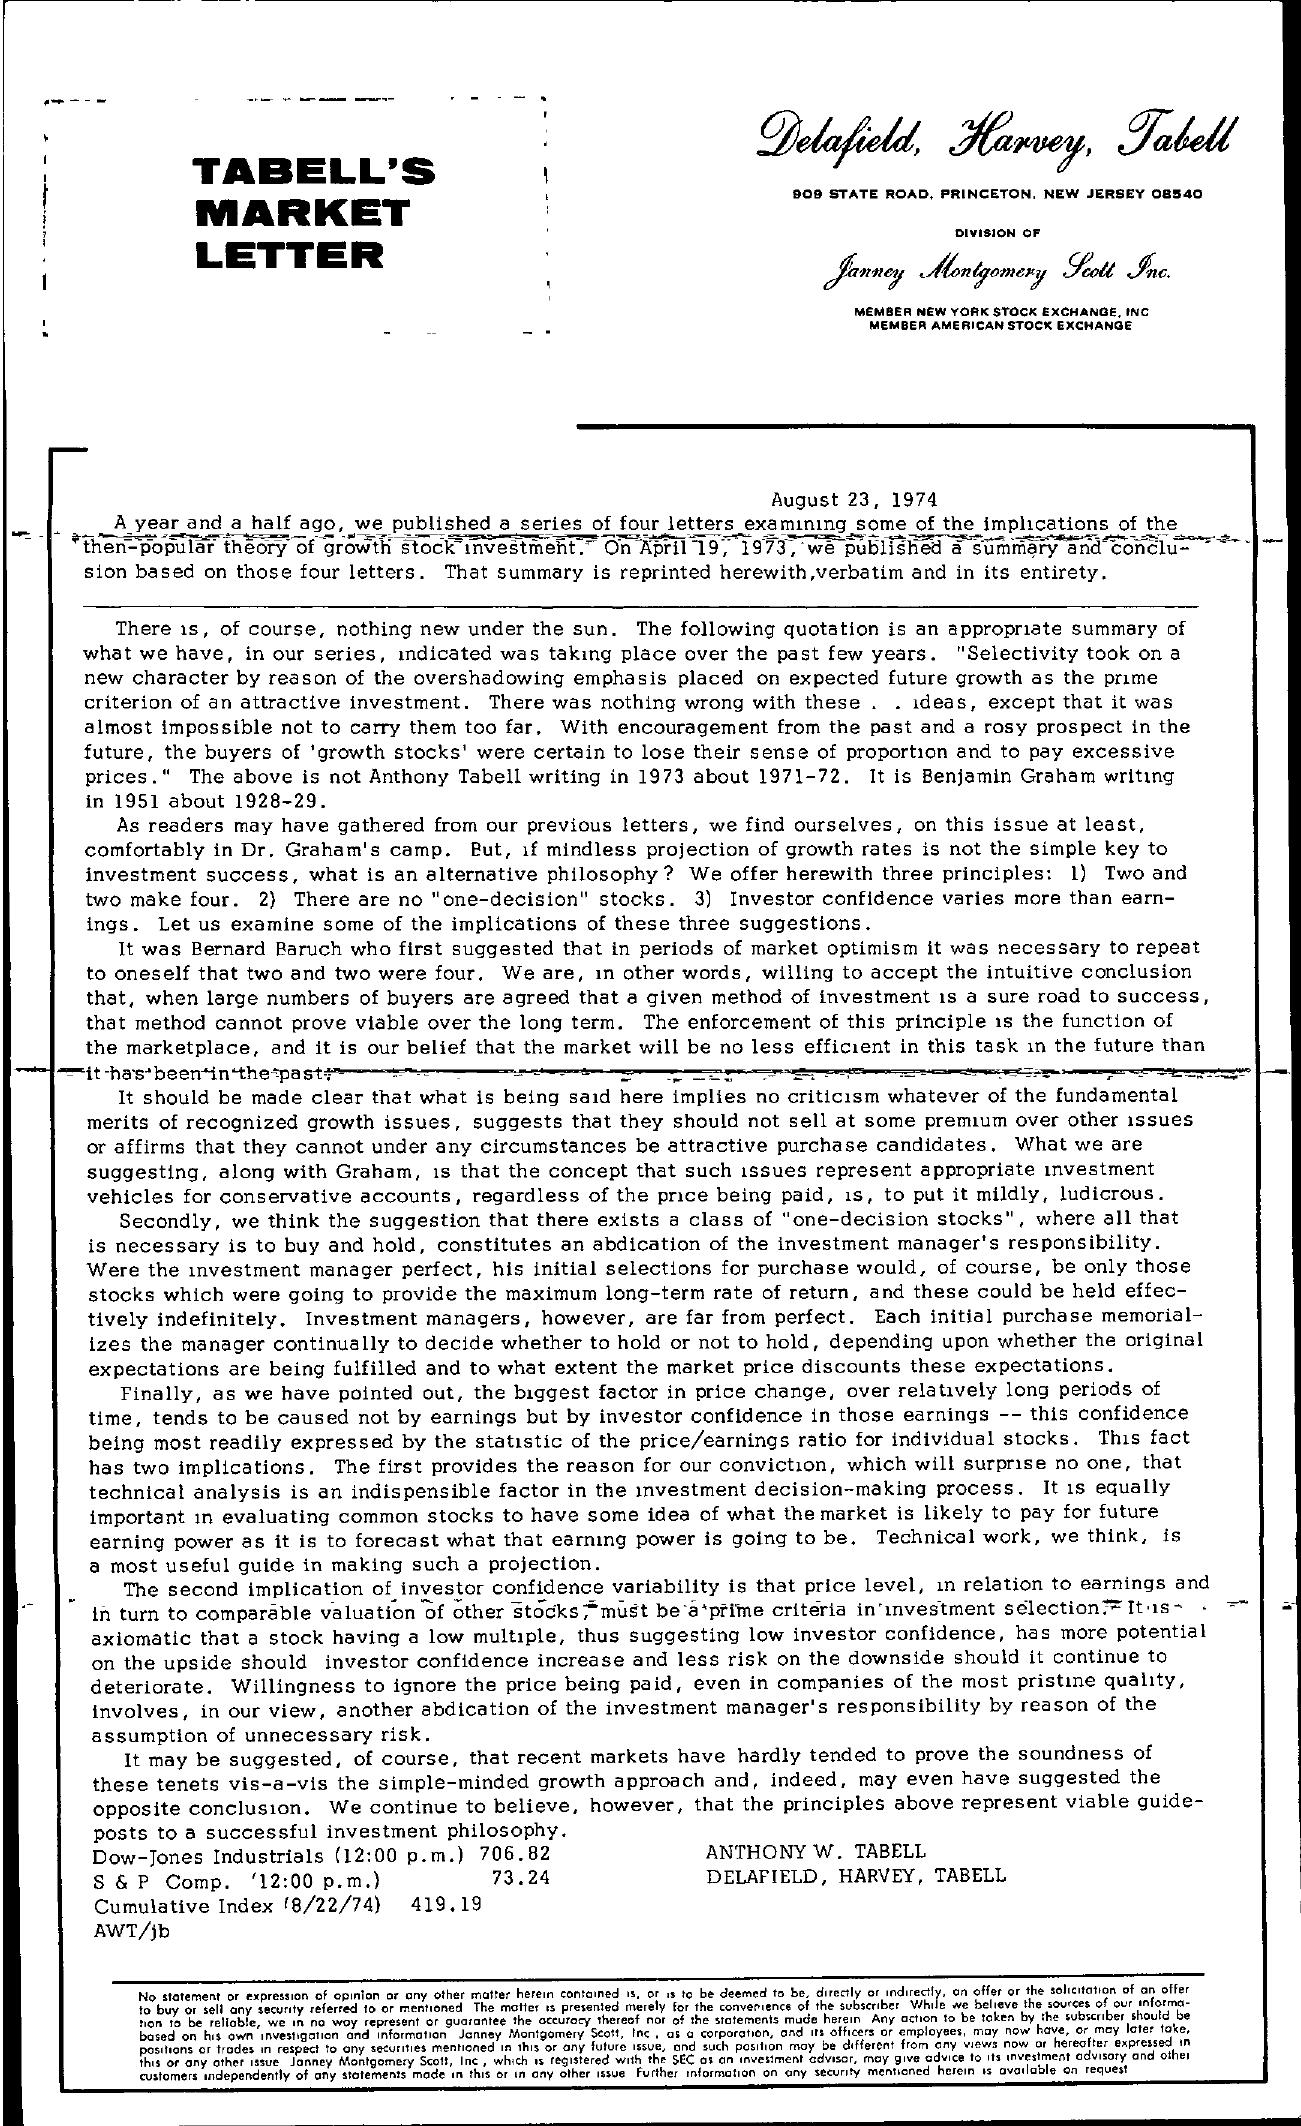 Tabell's Market Letter - August 23, 1974